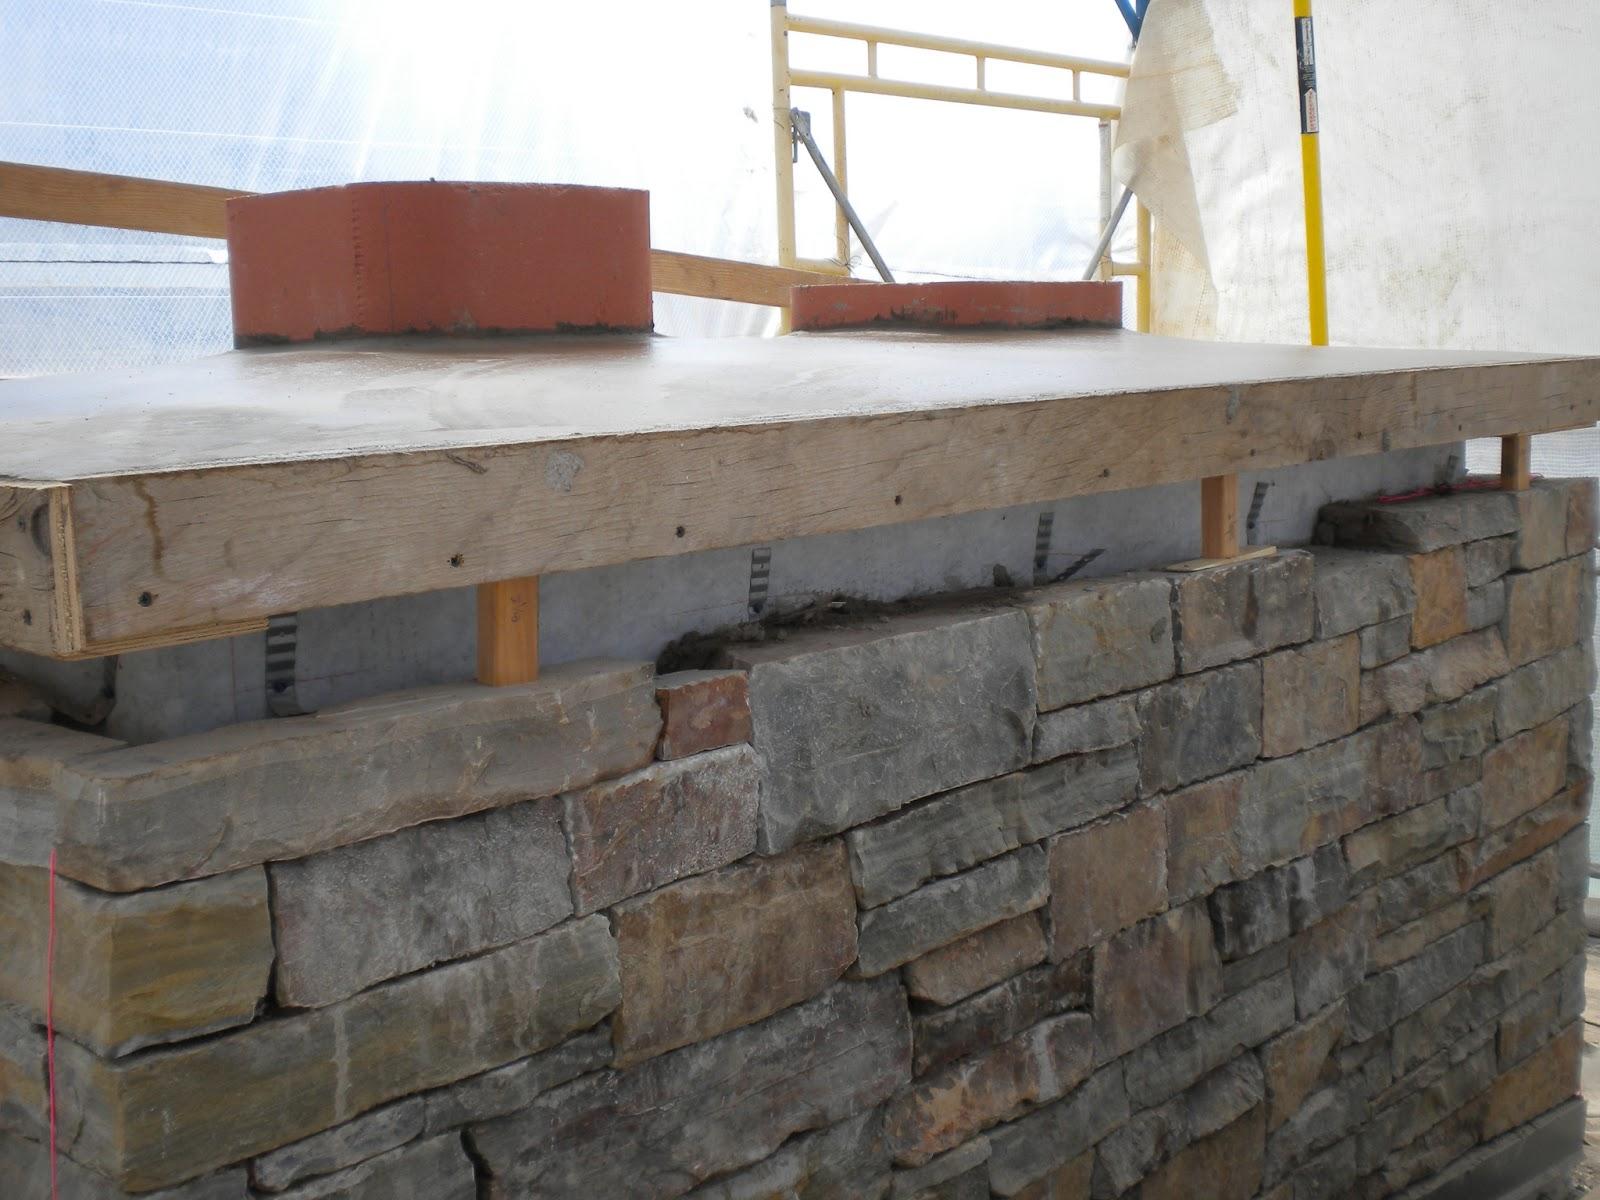 Concrete Chimney Cap : Boisineau masonry columbia project update